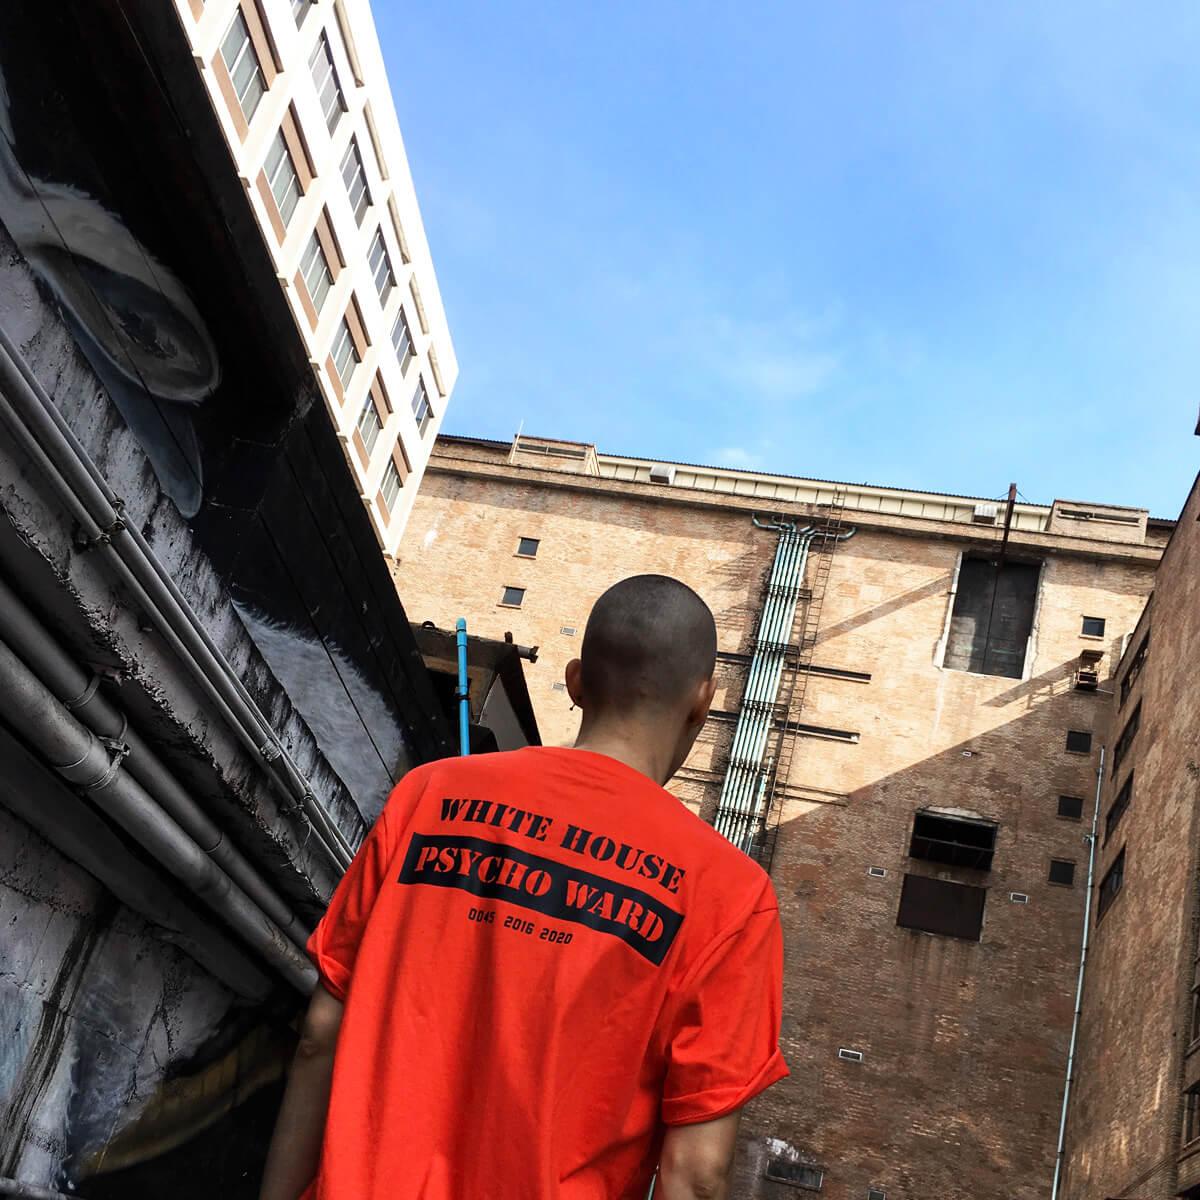 white house psycho ward prisoner t-shirt